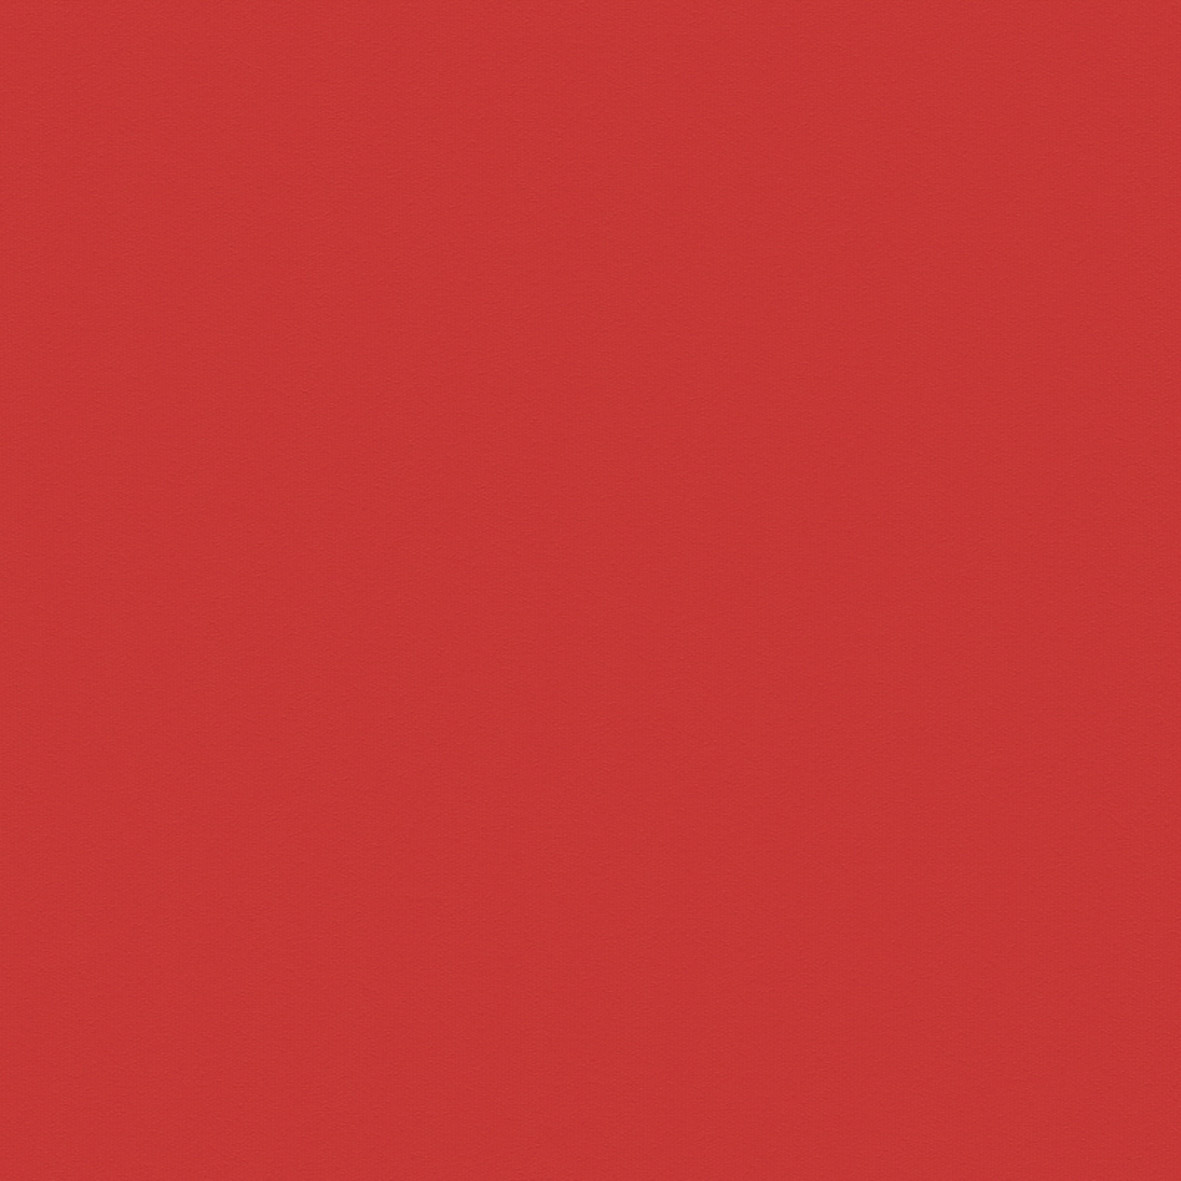 Roller_Swatch_Palette_Scarlet_RE0076